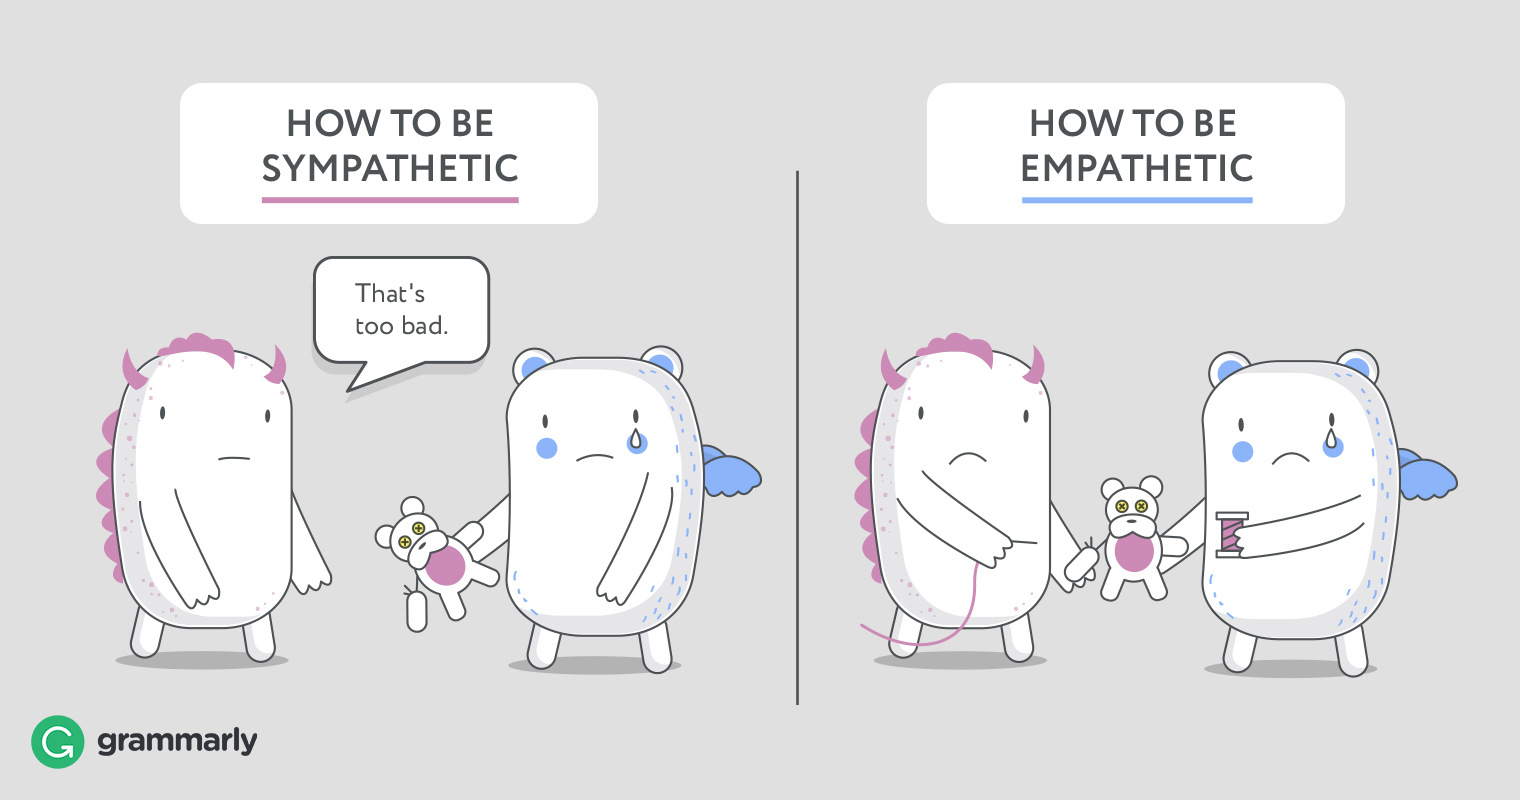 Empathetic Meaning